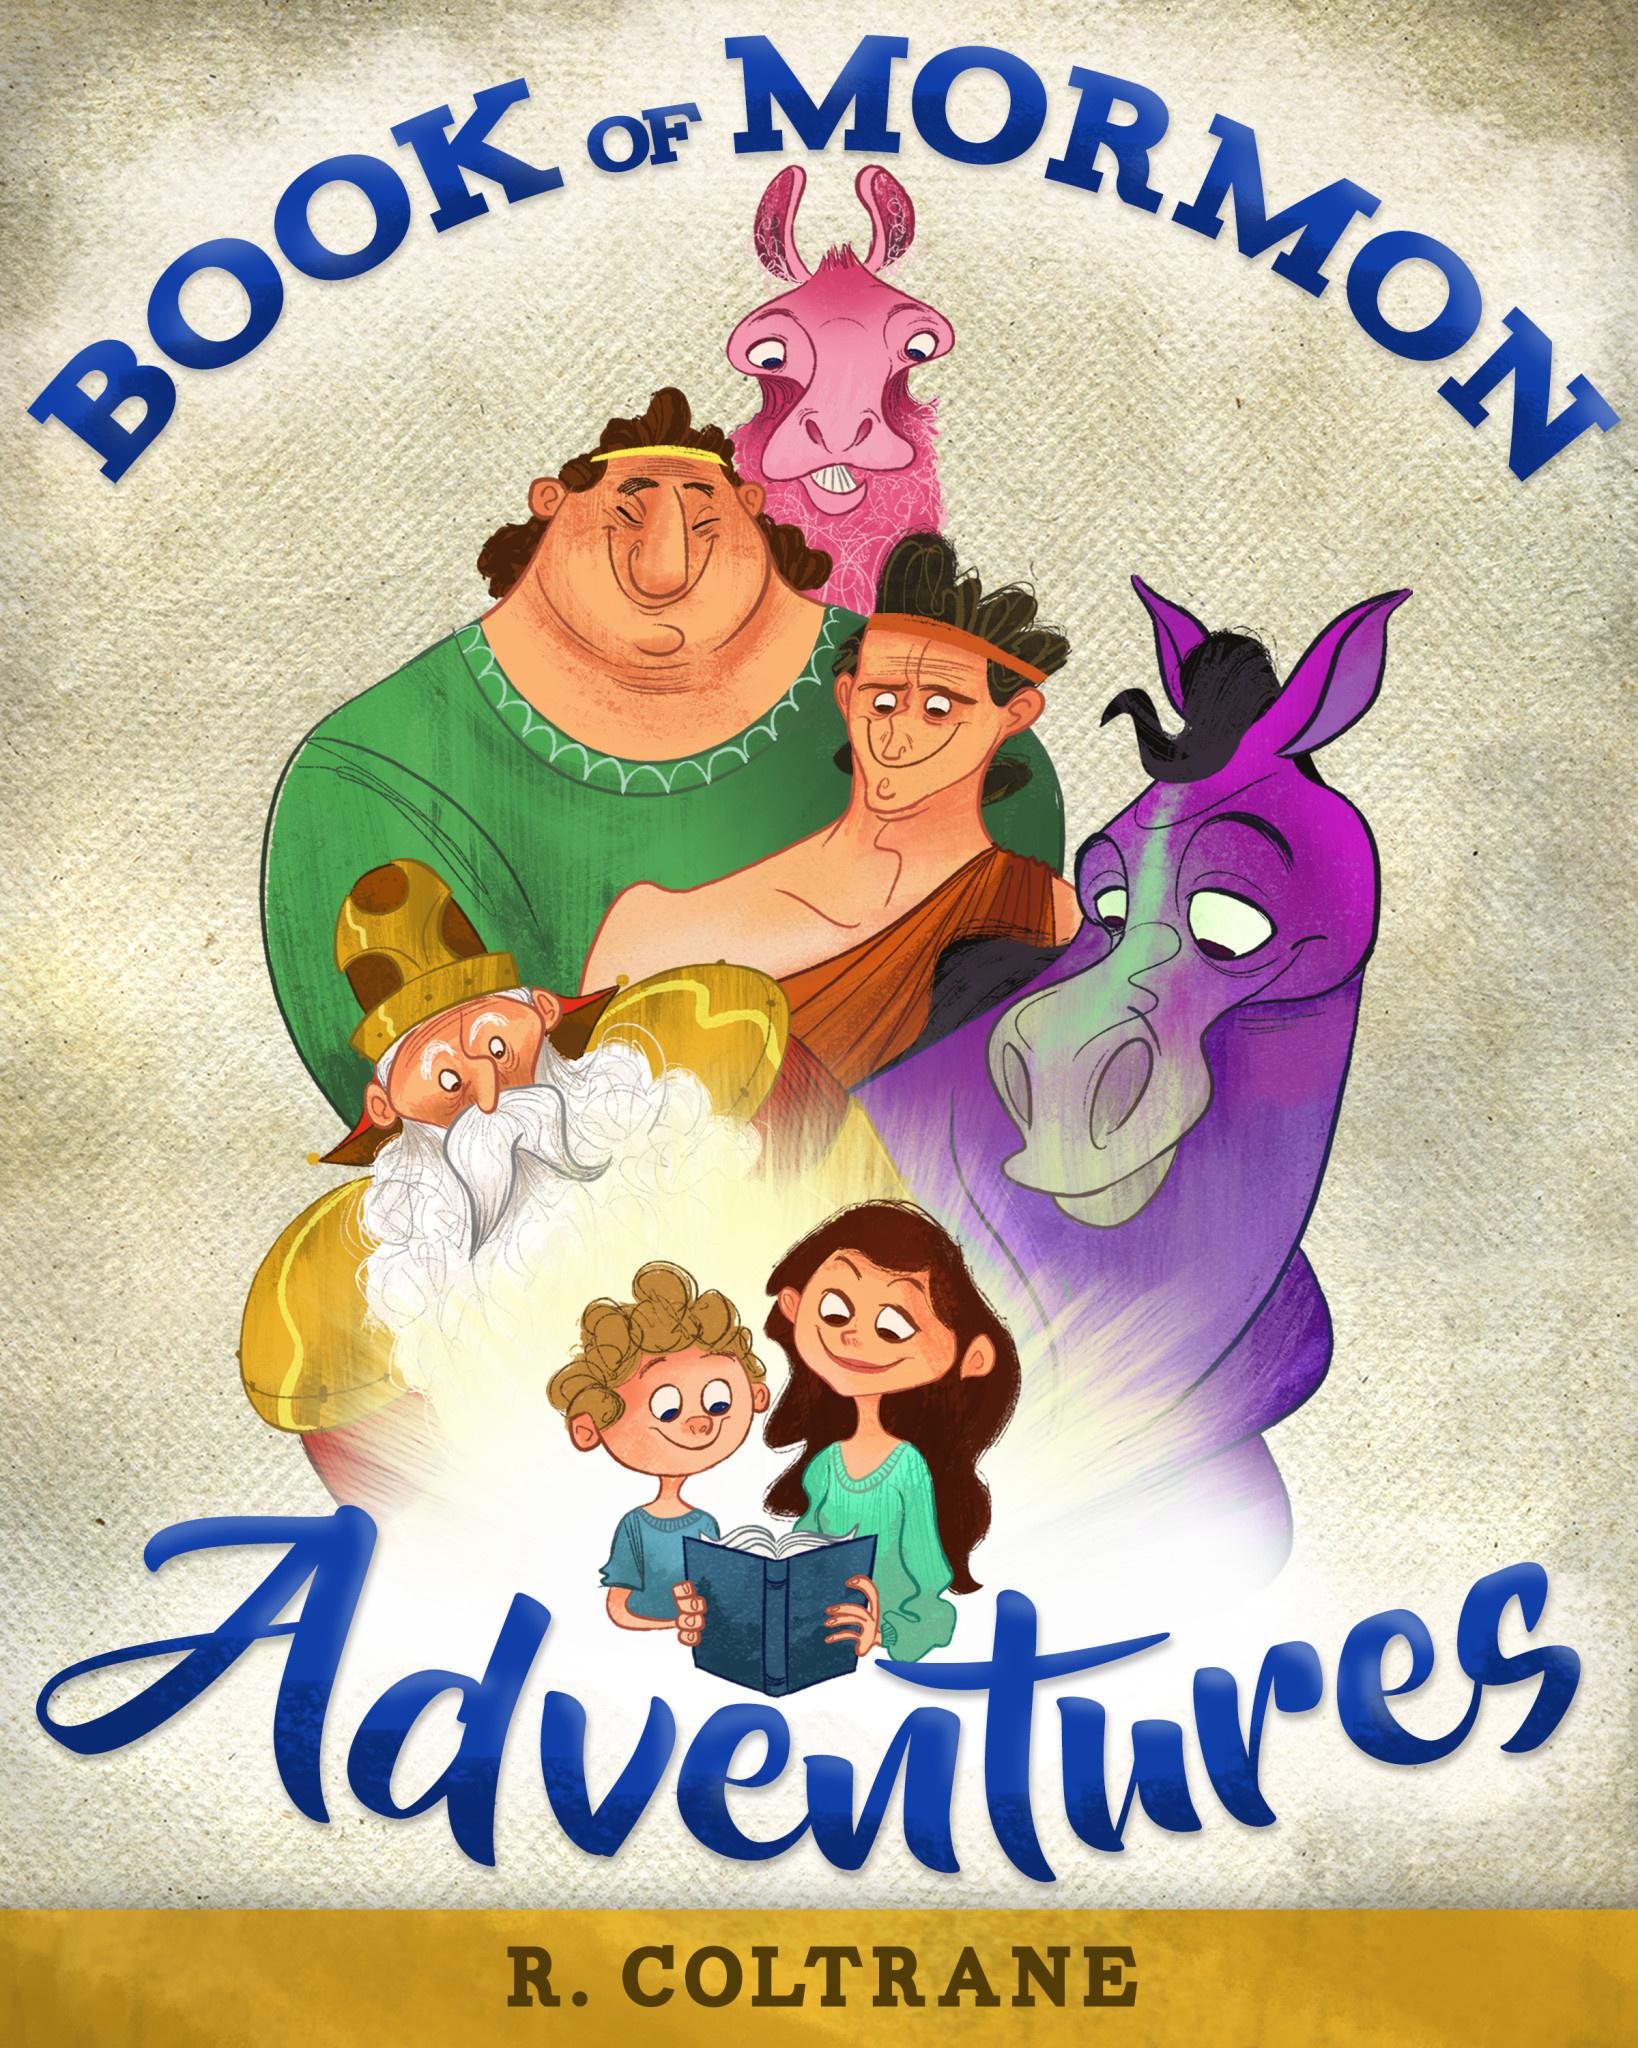 Book of Mormon Adventures